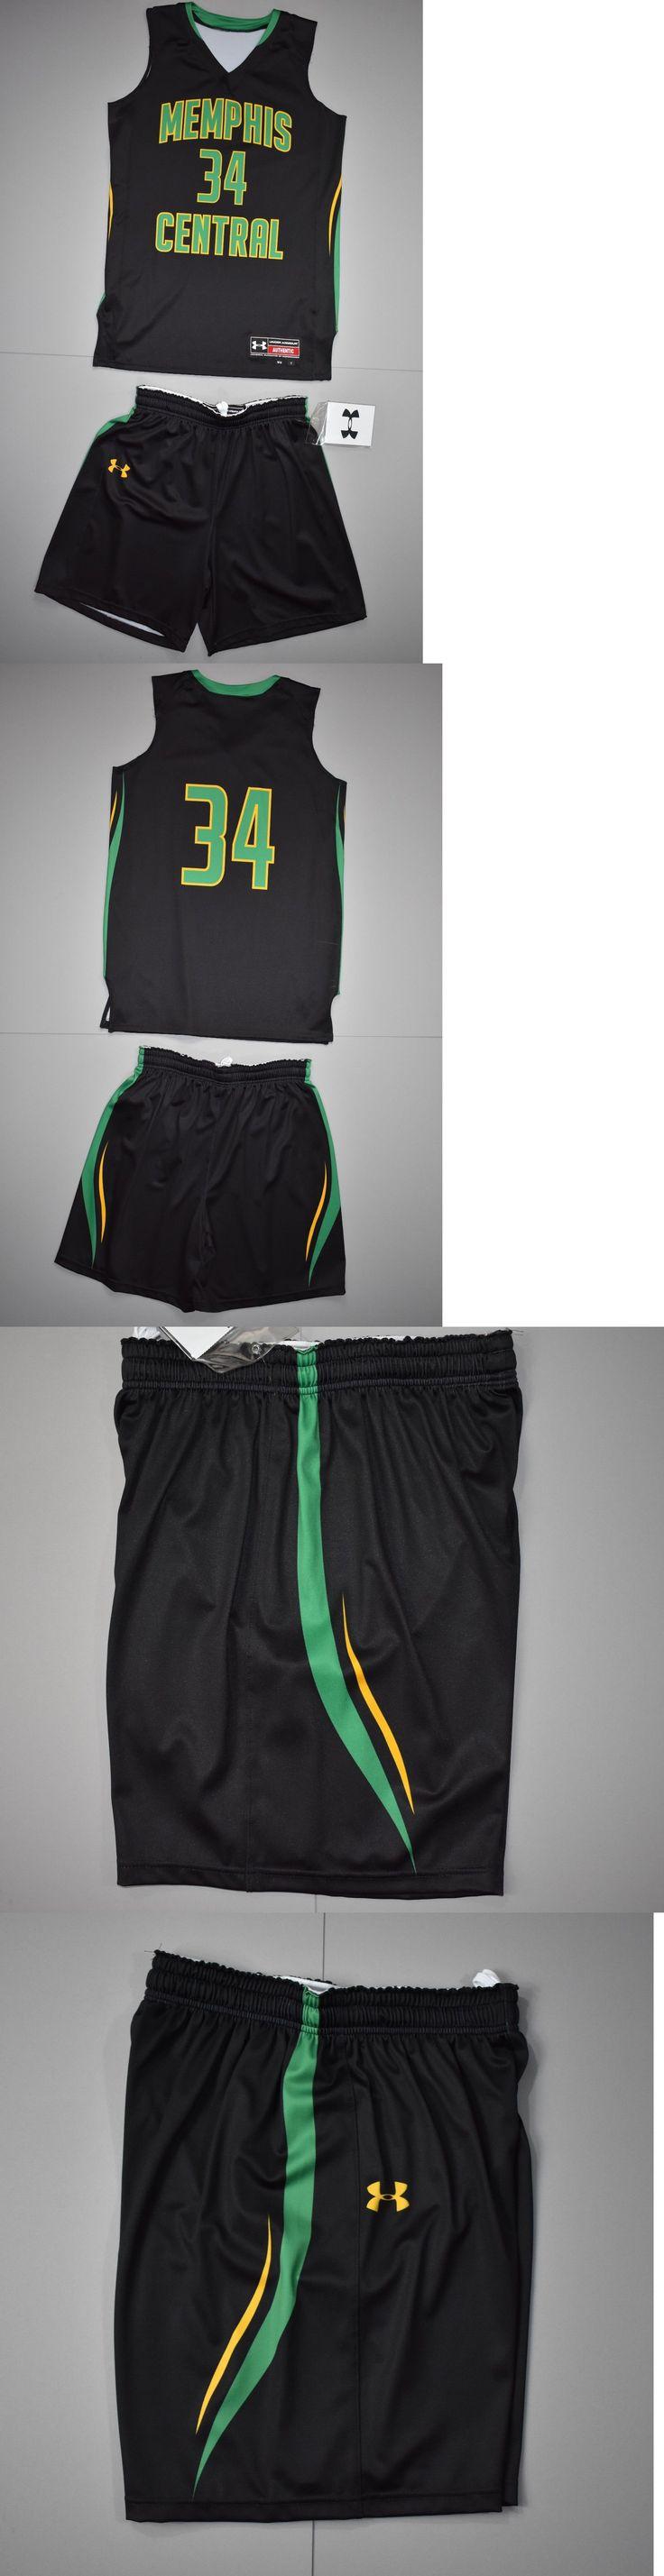 Women 158966: Under Armour Women'S Basketball Uniform Jersey Shorts Medium Memphis Central -> BUY IT NOW ONLY: $38.24 on eBay!